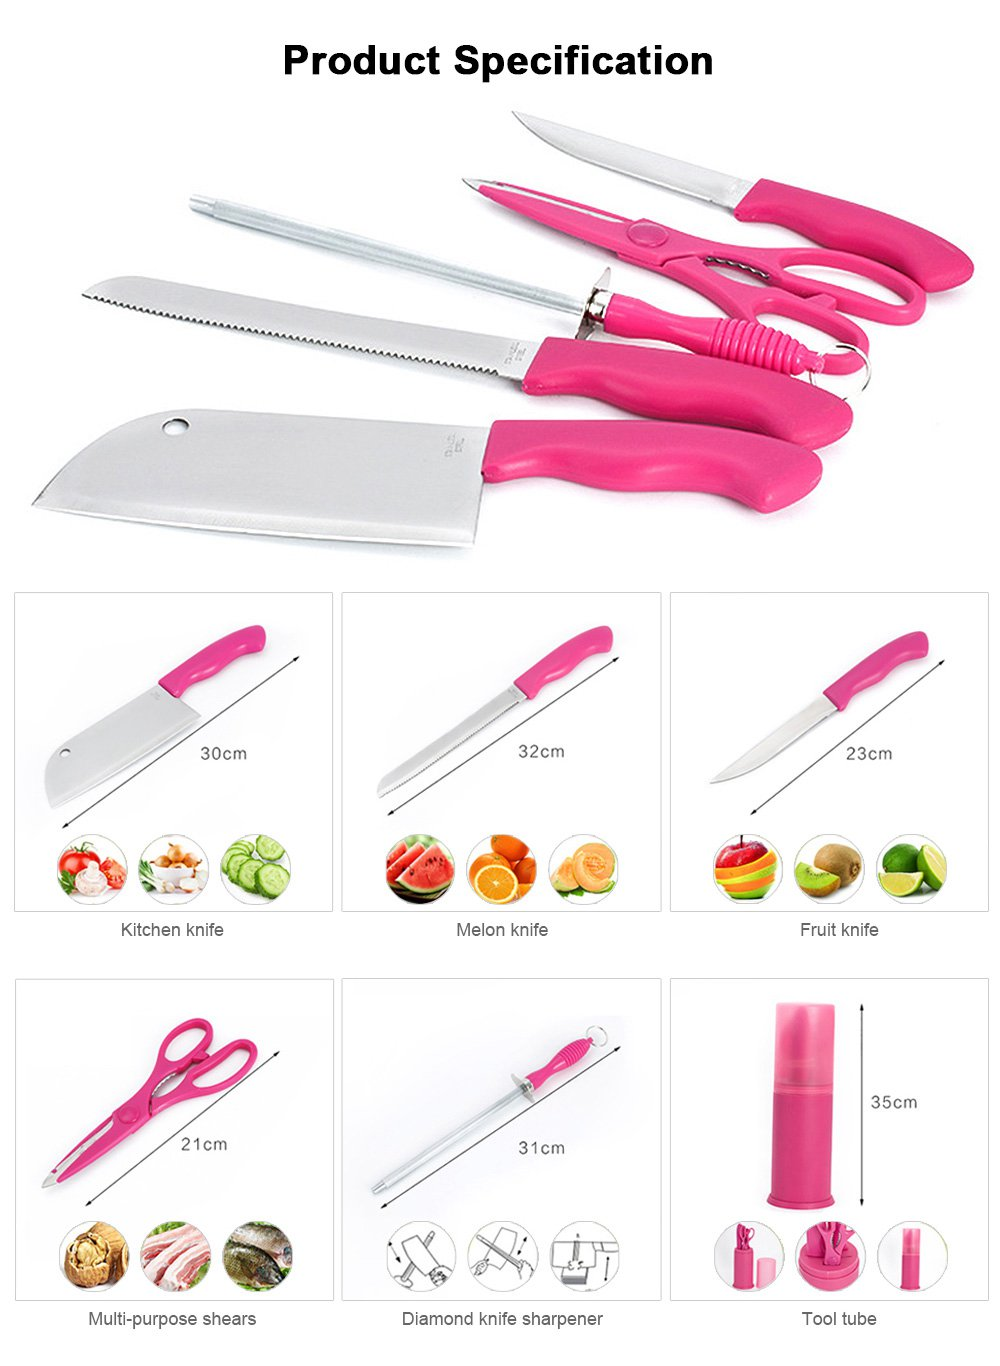 Portable Multiple-use Picnic Knife Set with Stainless Steel Kitchen Knife, Use as Scissors, Frozen Meat Knife, Sharpener, Fruit Knife Set 4